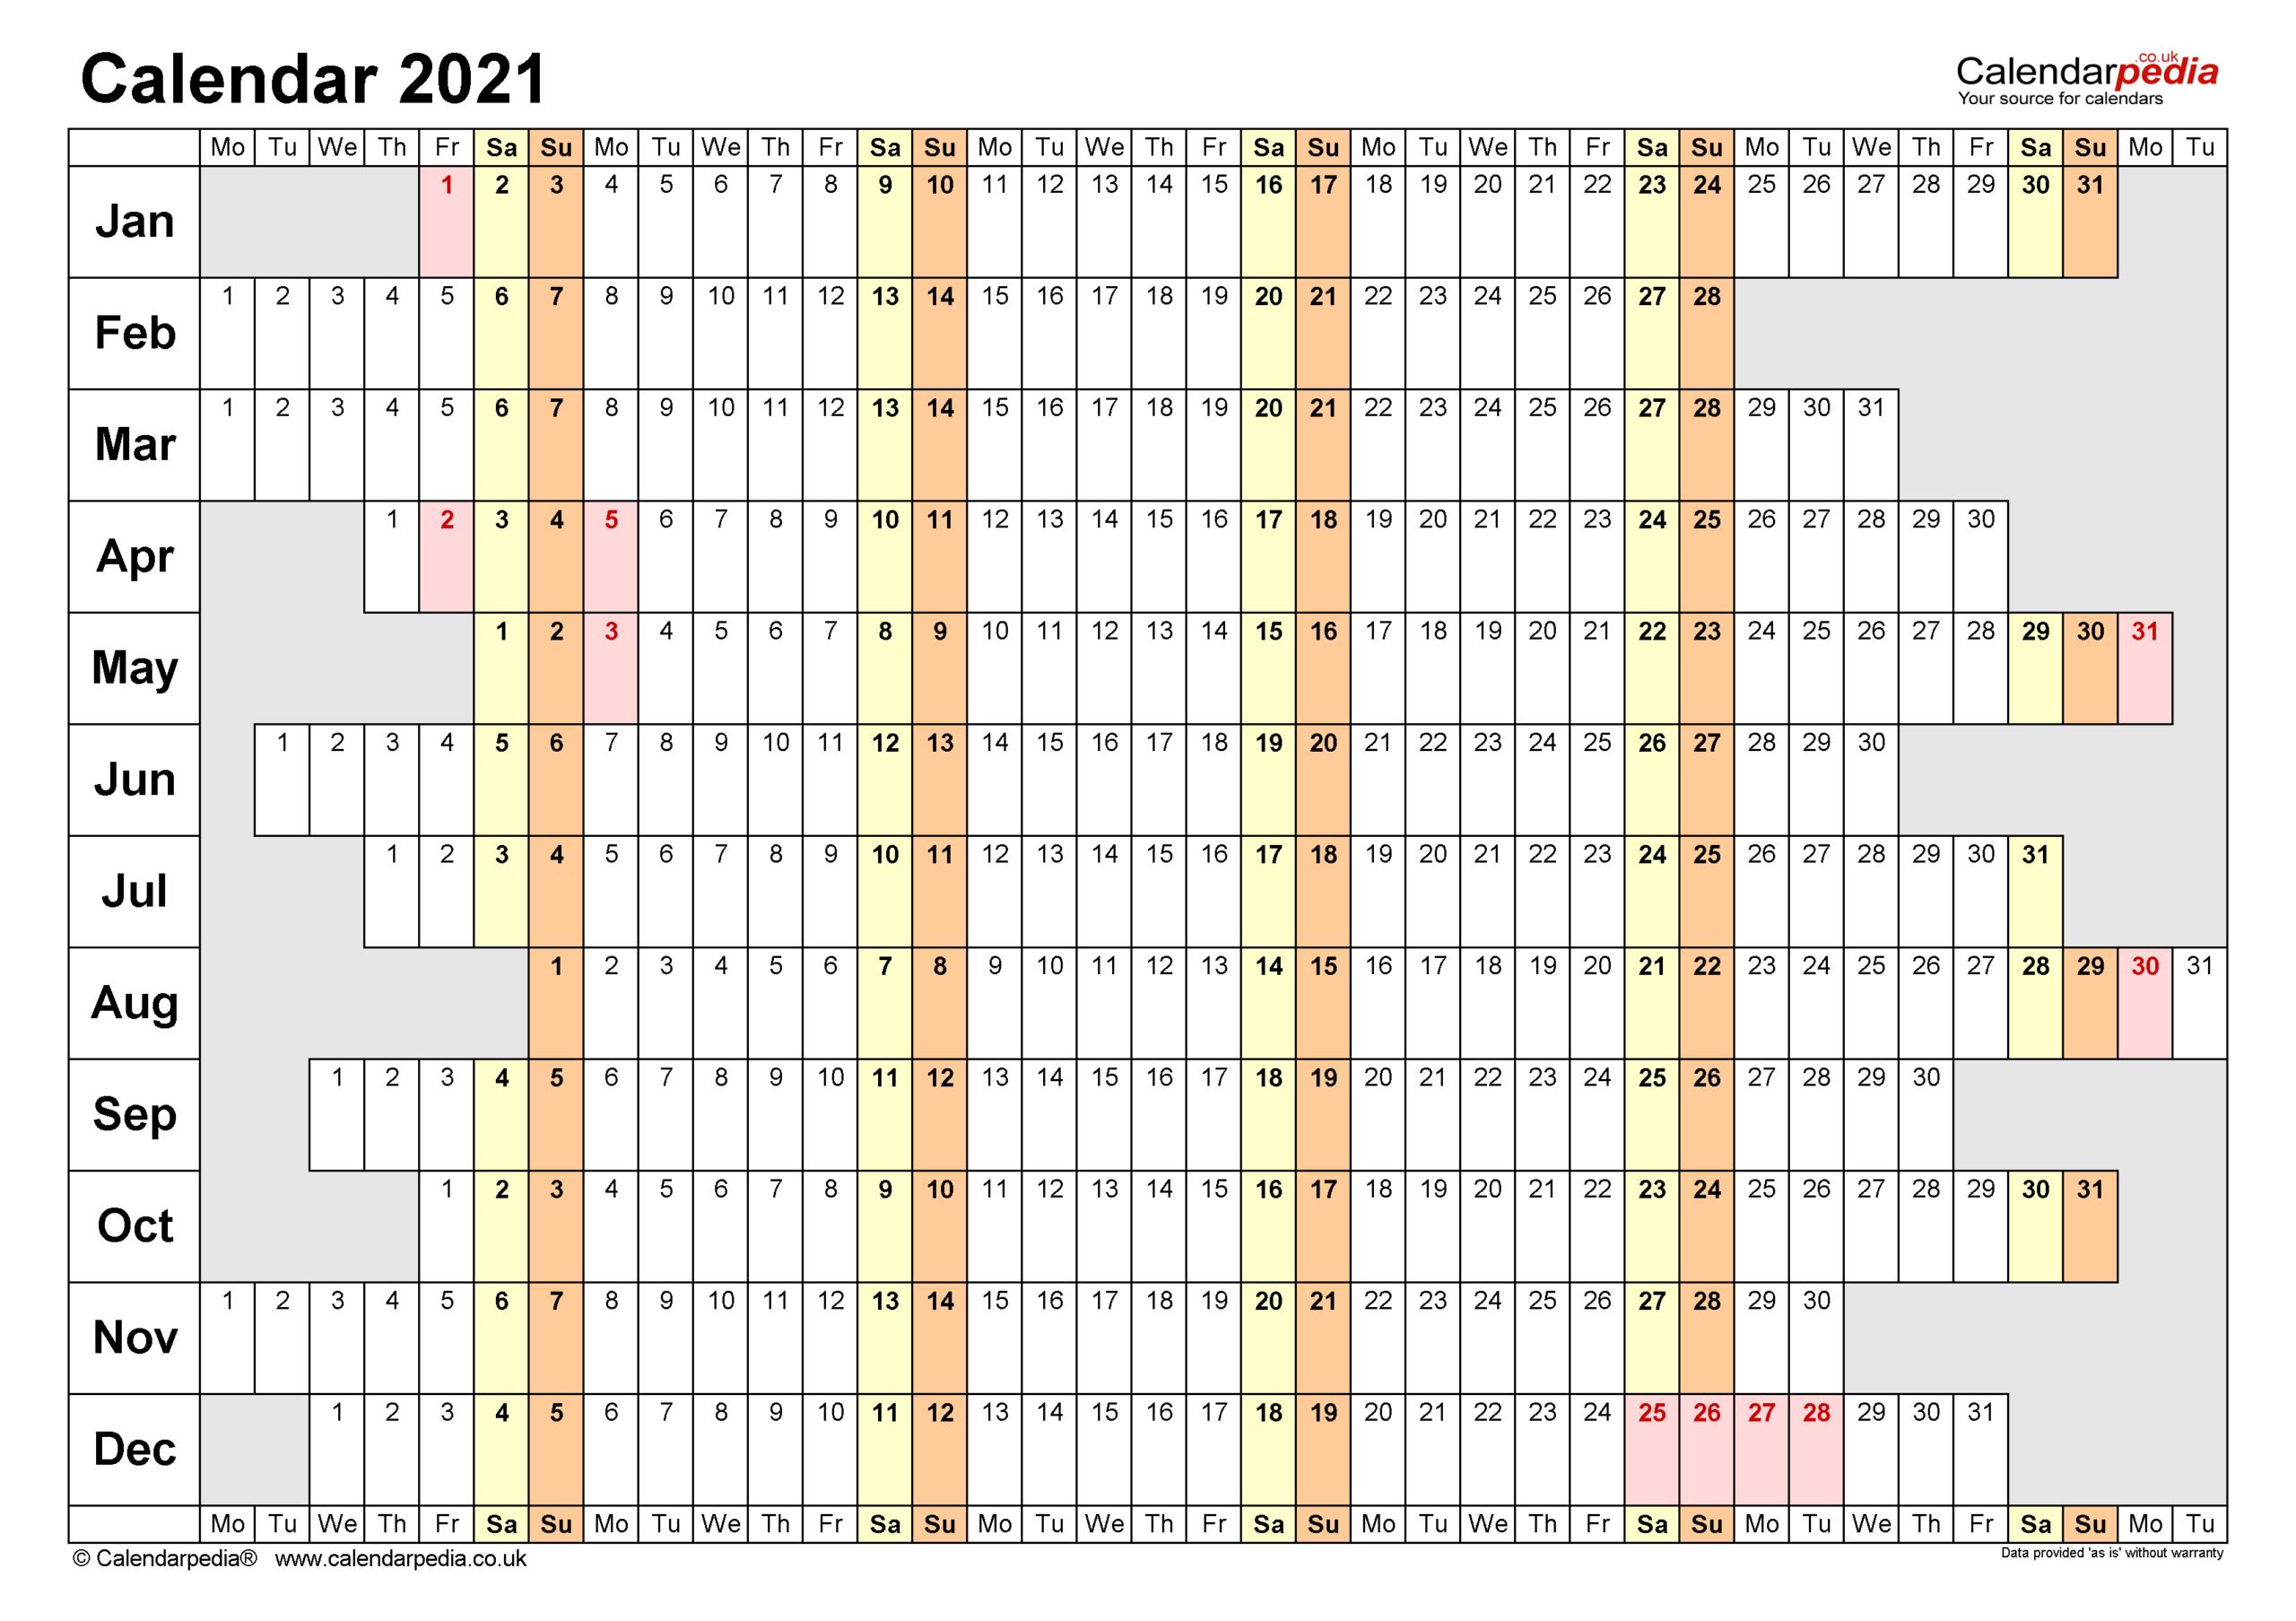 Calendar 2021 (Uk) - Free Printable Pdf Templates within 2021 Printable Yearly Calendar Template